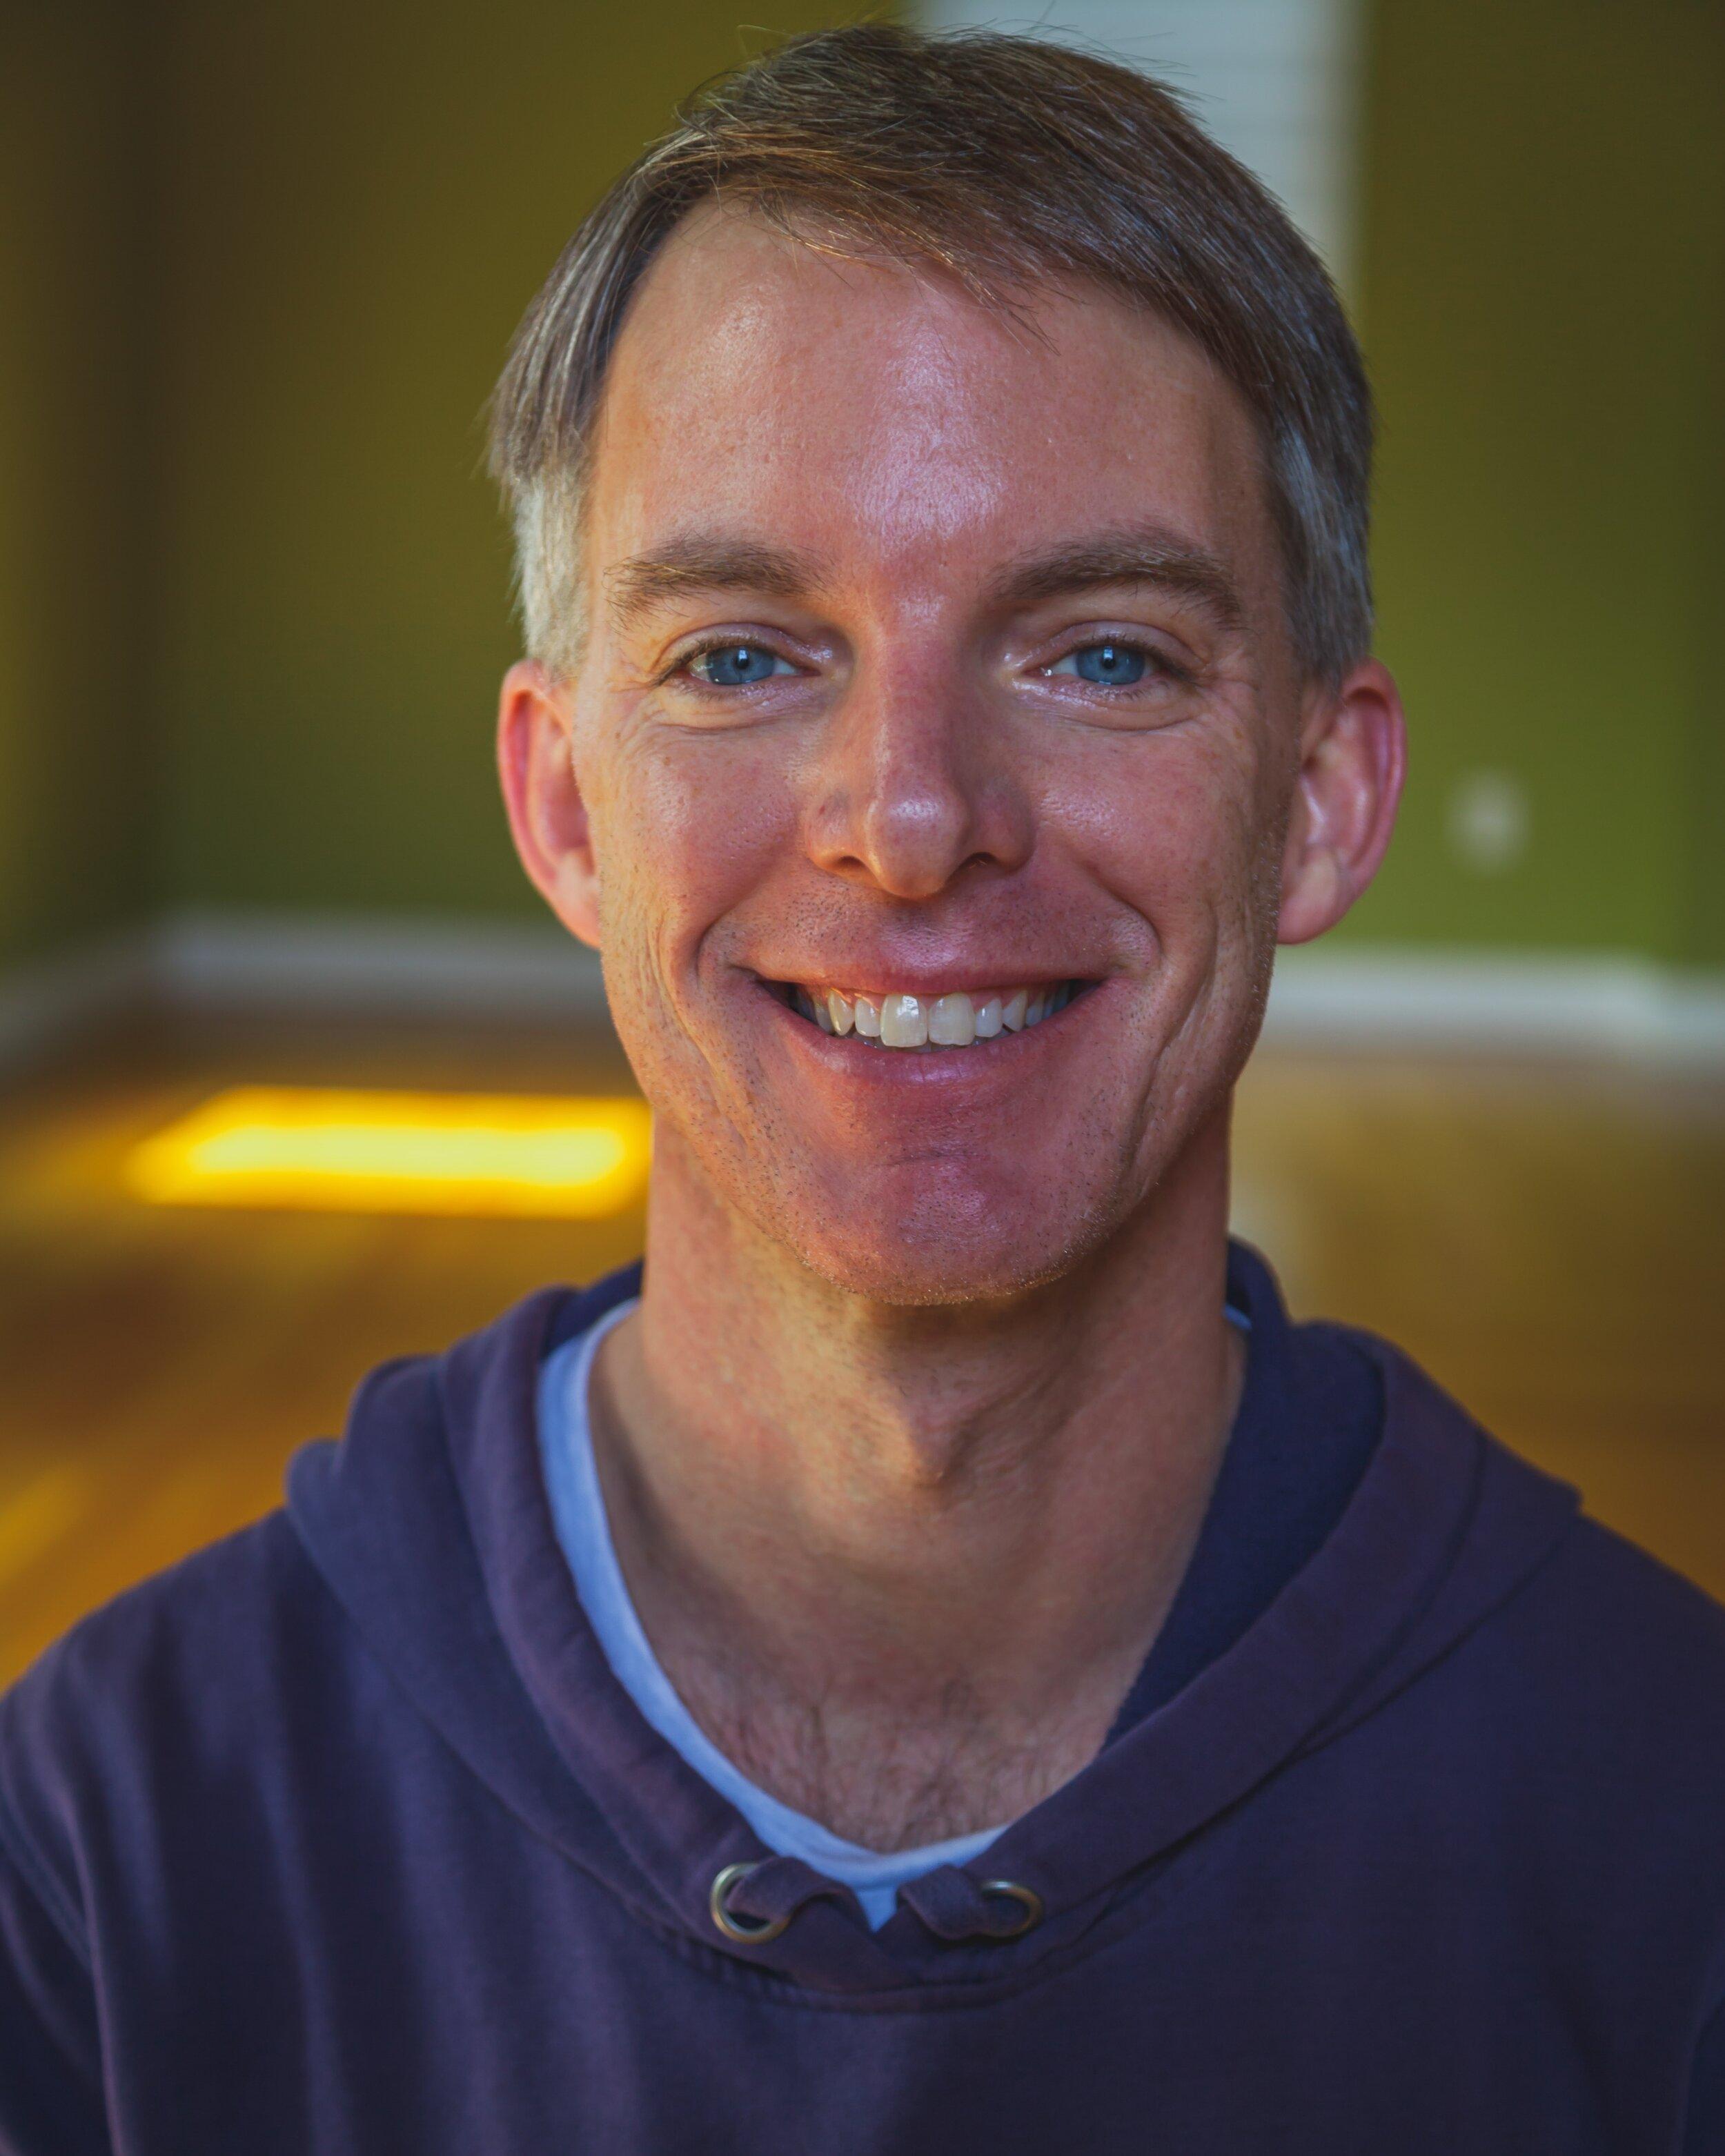 Daniel J. Libby, Executive Director & Founder